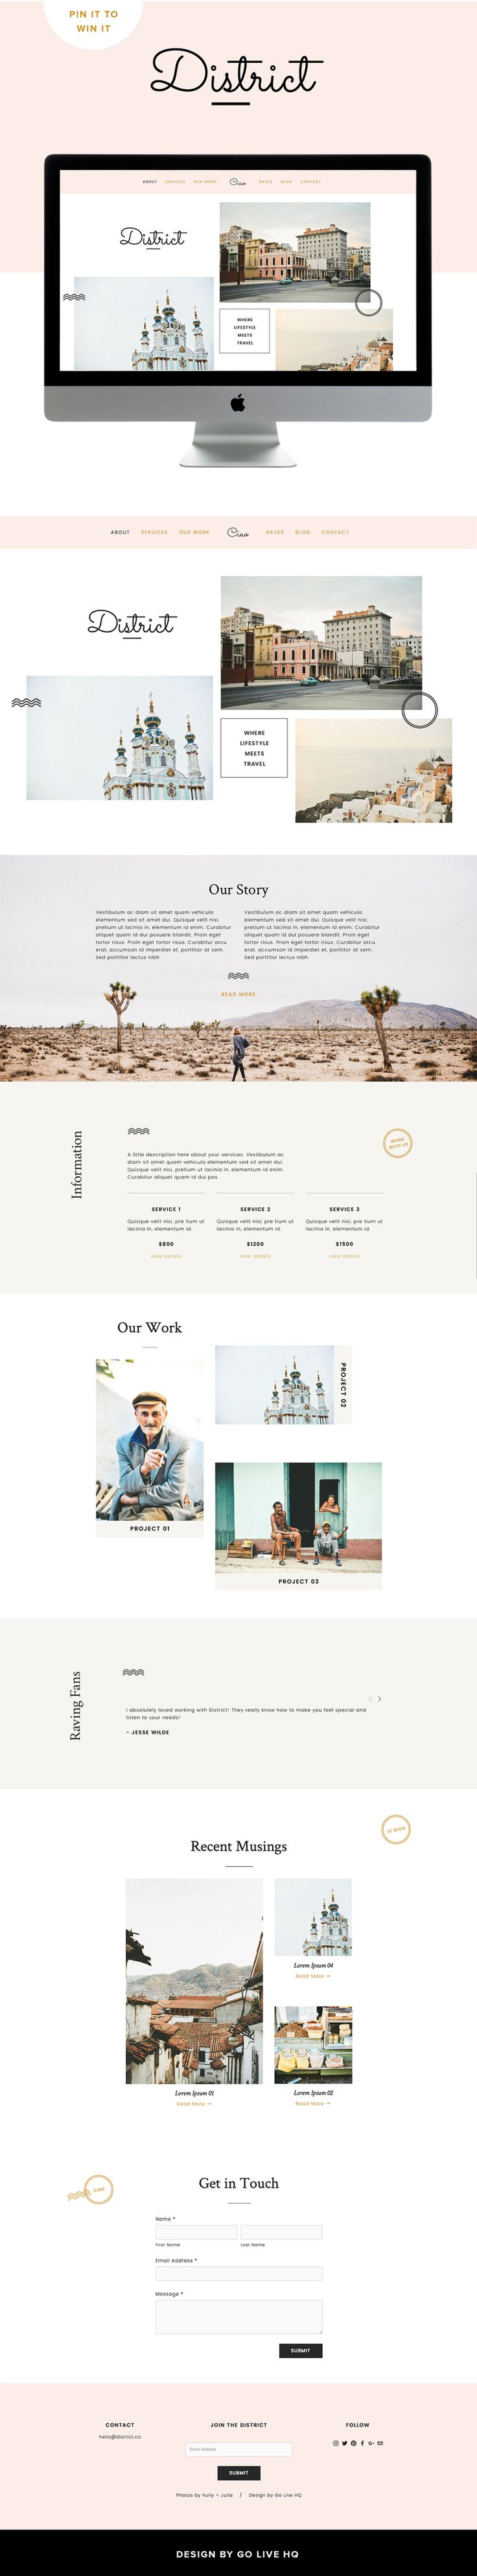 70 best Squarespace & Website Envy images on Pinterest | Design ...